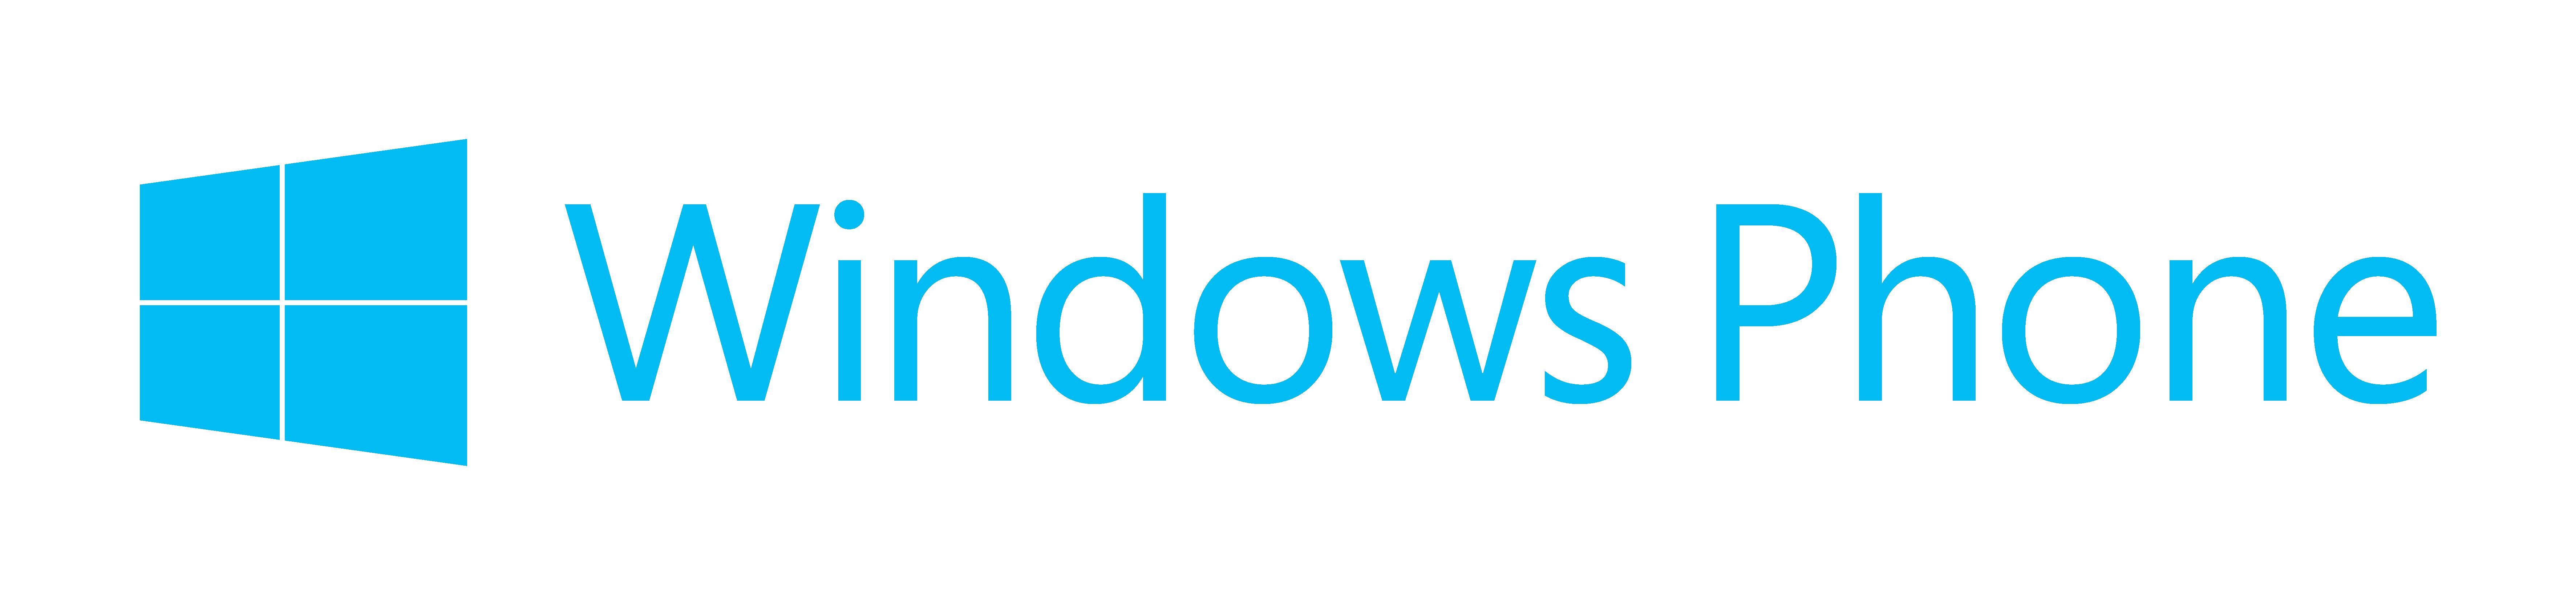 Windows Phone Logo PNG Wallpaper